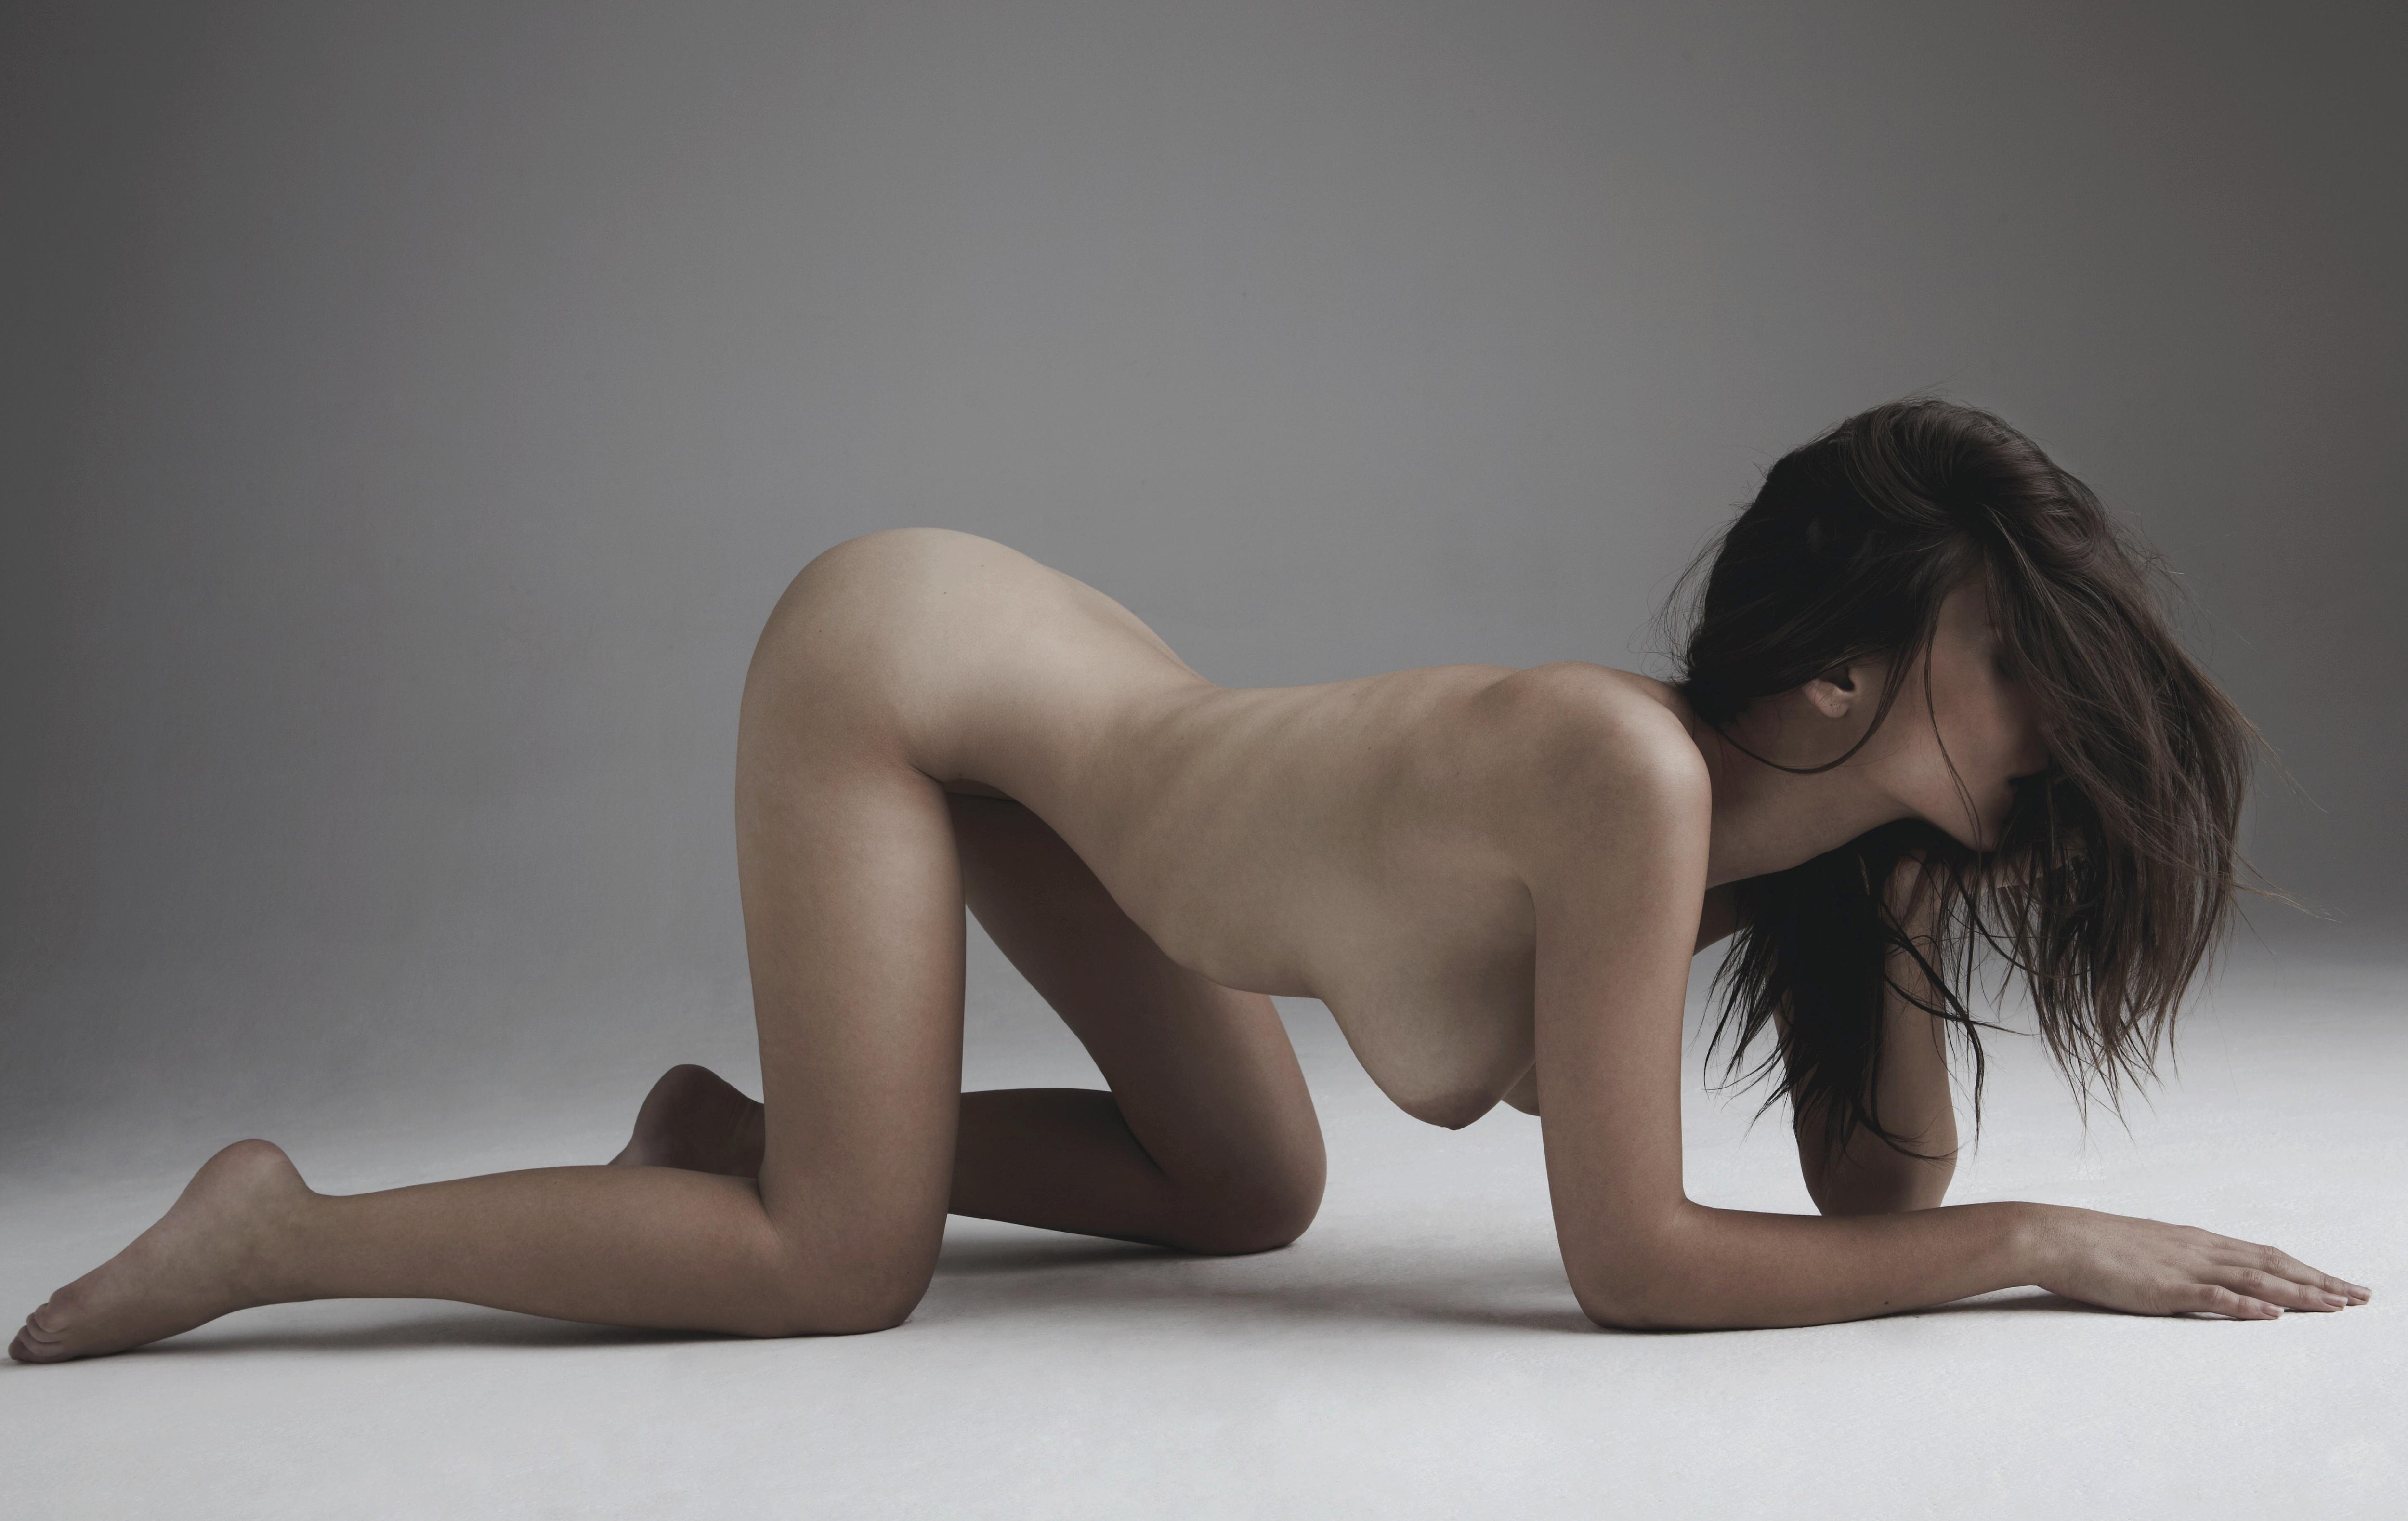 Fuck Emily Ratajkowski nudes (25 photos), Pussy, Bikini, Boobs, butt 2017